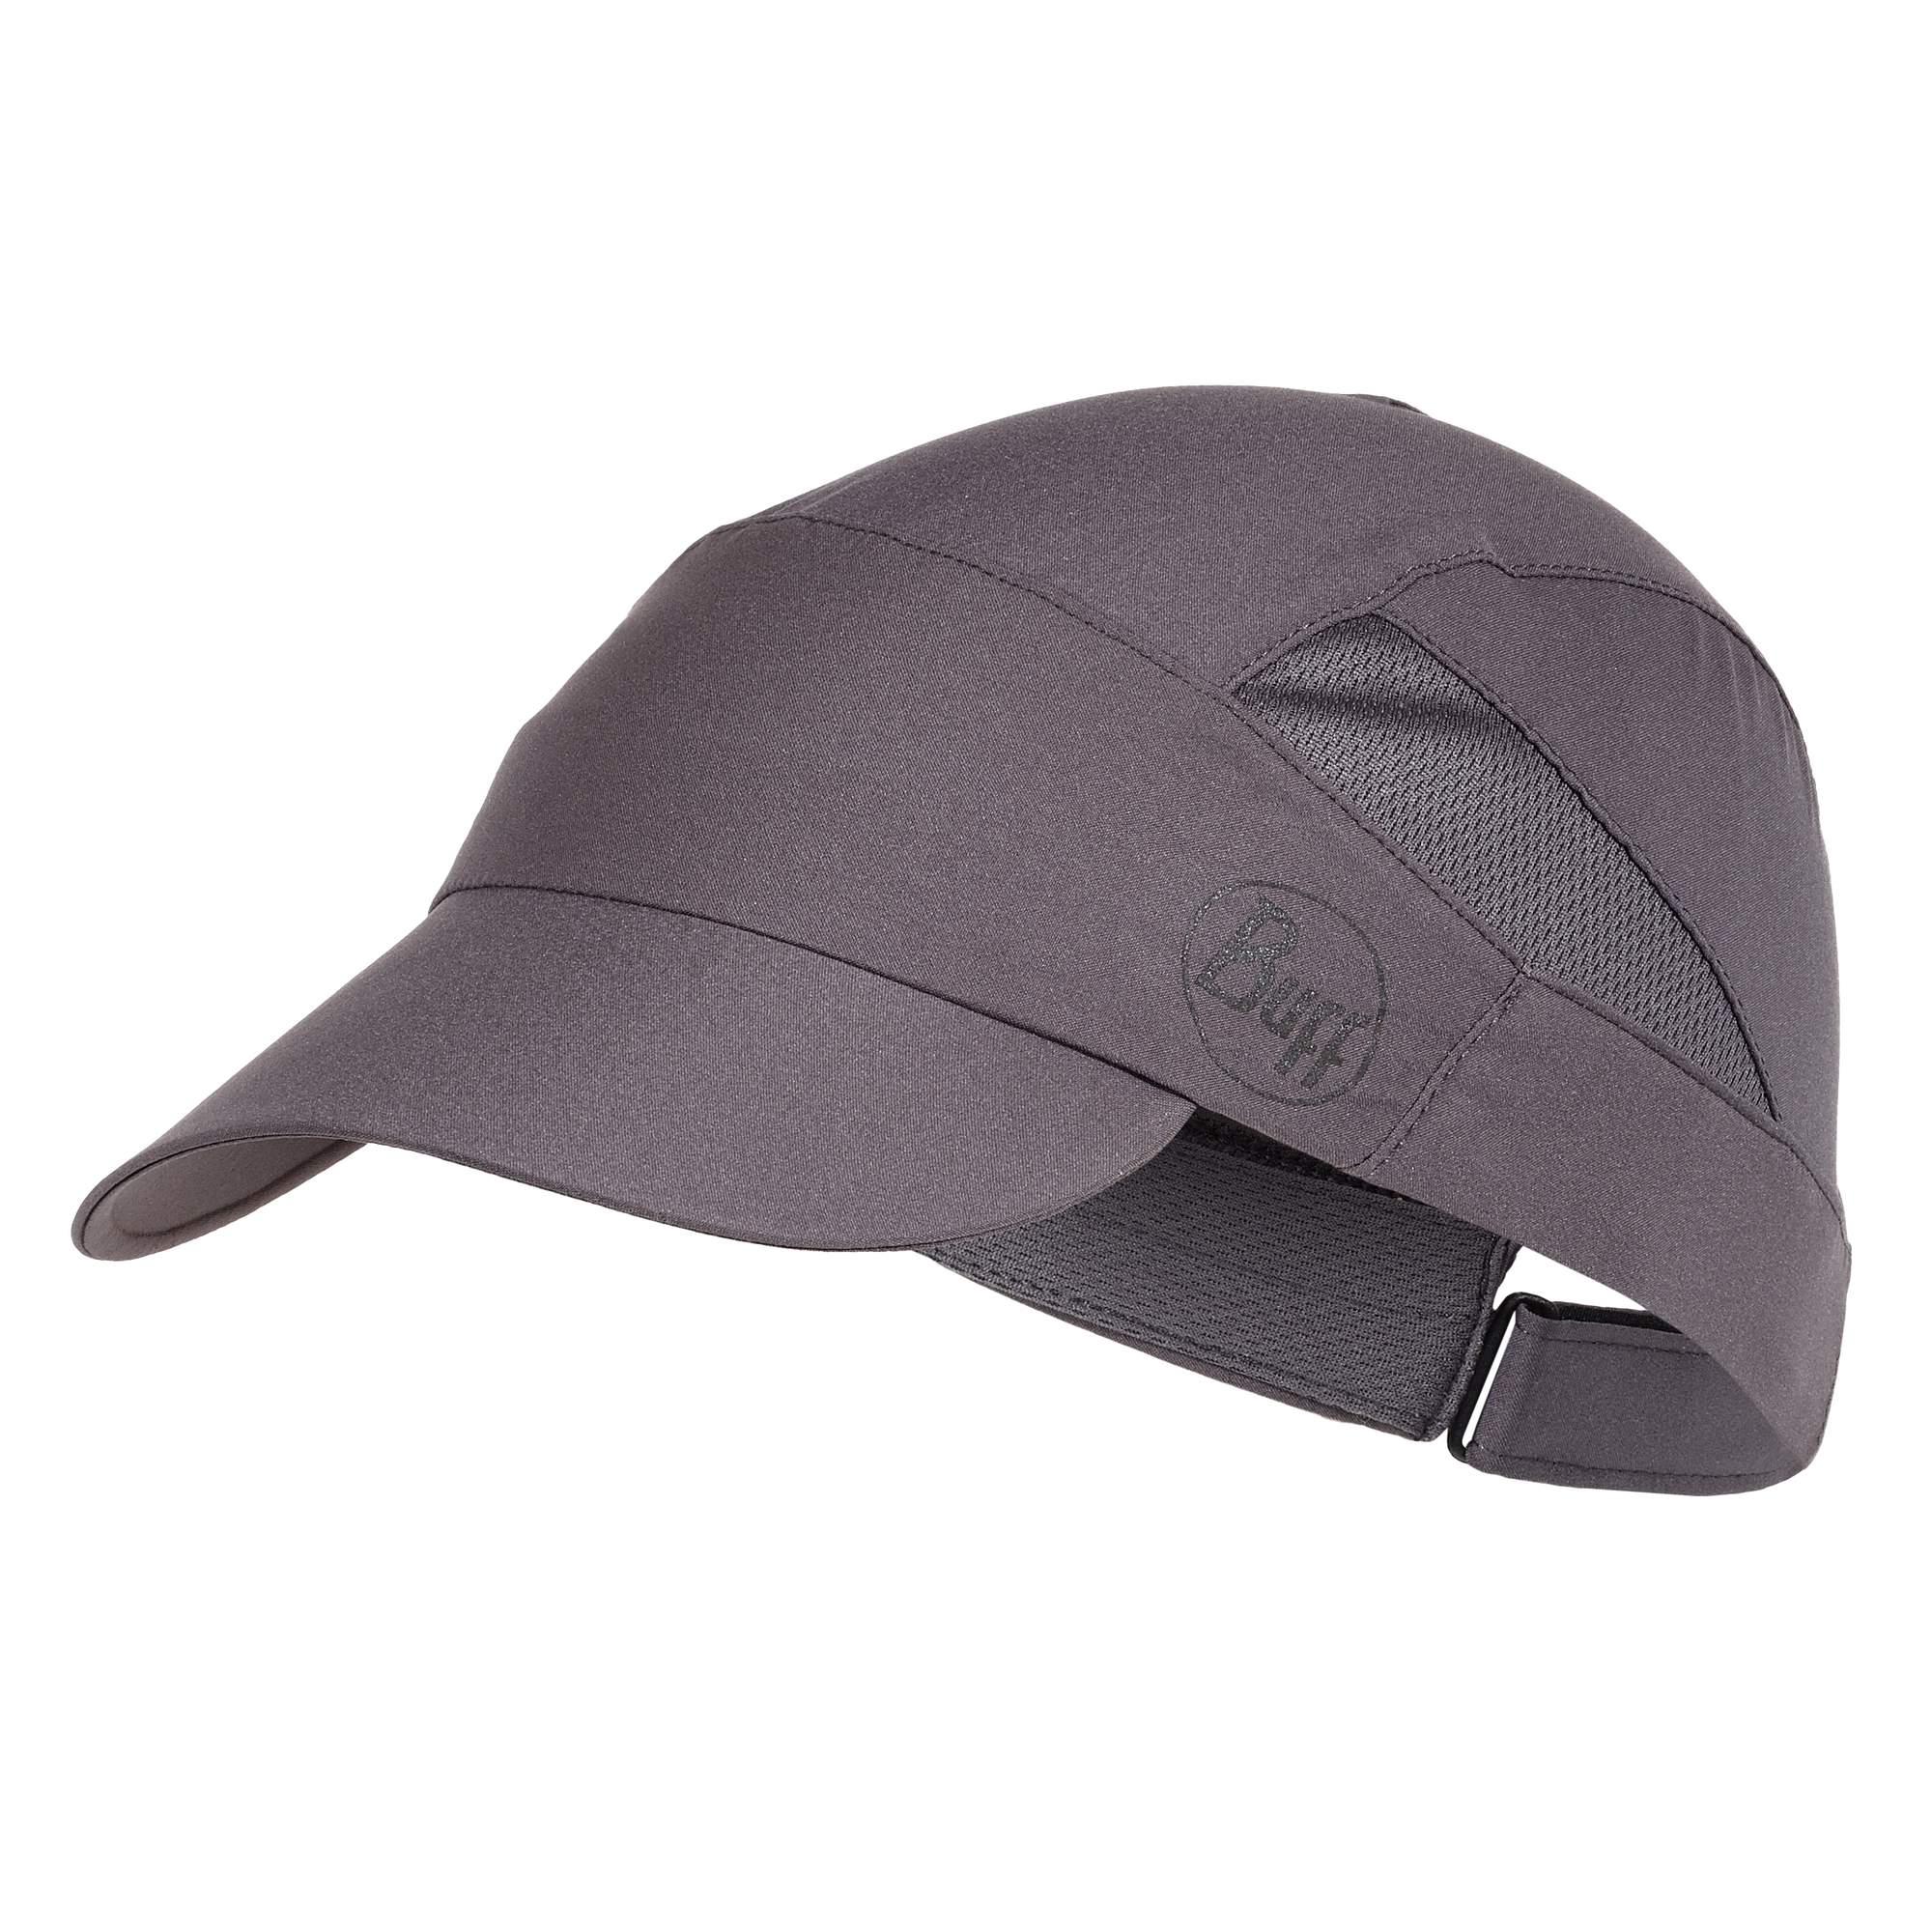 Buff Pack Trek Cap Unisex Gr. uni - Mütze - grau